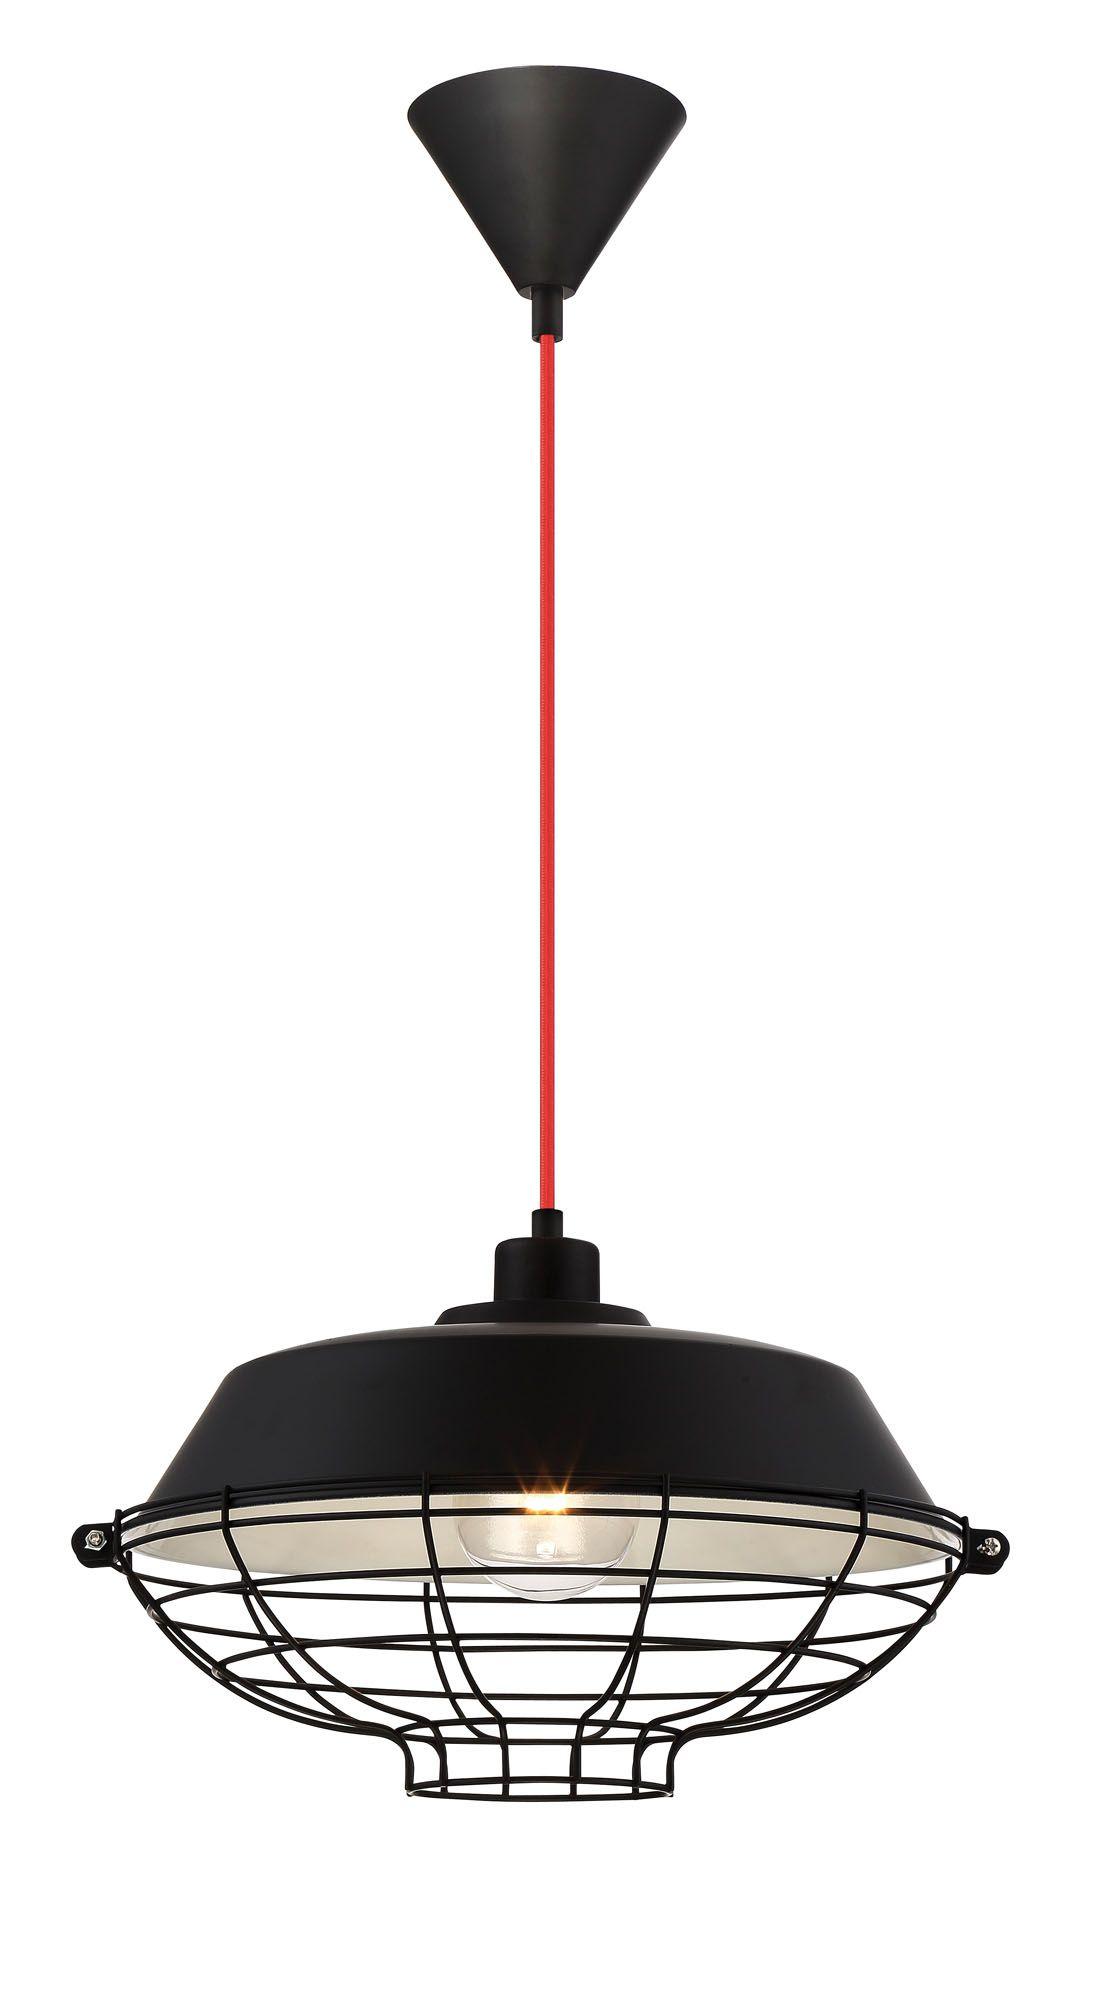 Luminaire Suspendu LONDON 1 lumi¨re fini noir avec fil rouge